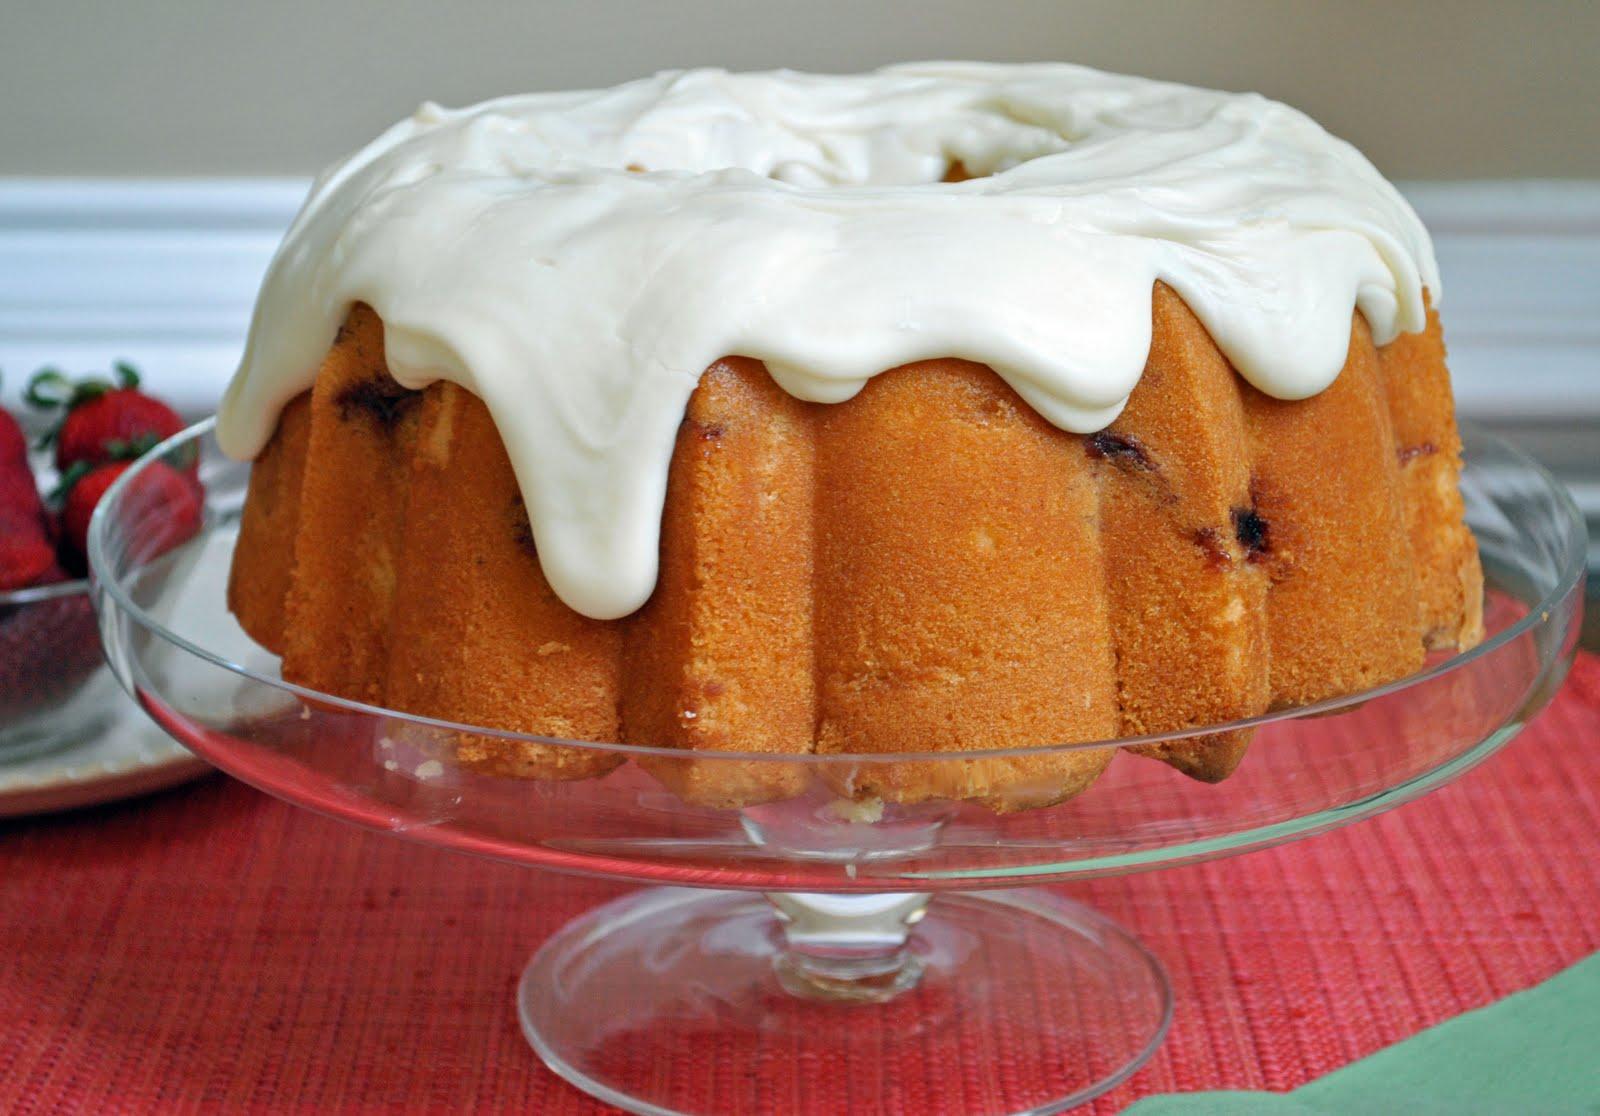 Cake Recipes With Glaze Icing: Ryan Bakes: Strawberry Pound Cake With Cream Cheese Glaze